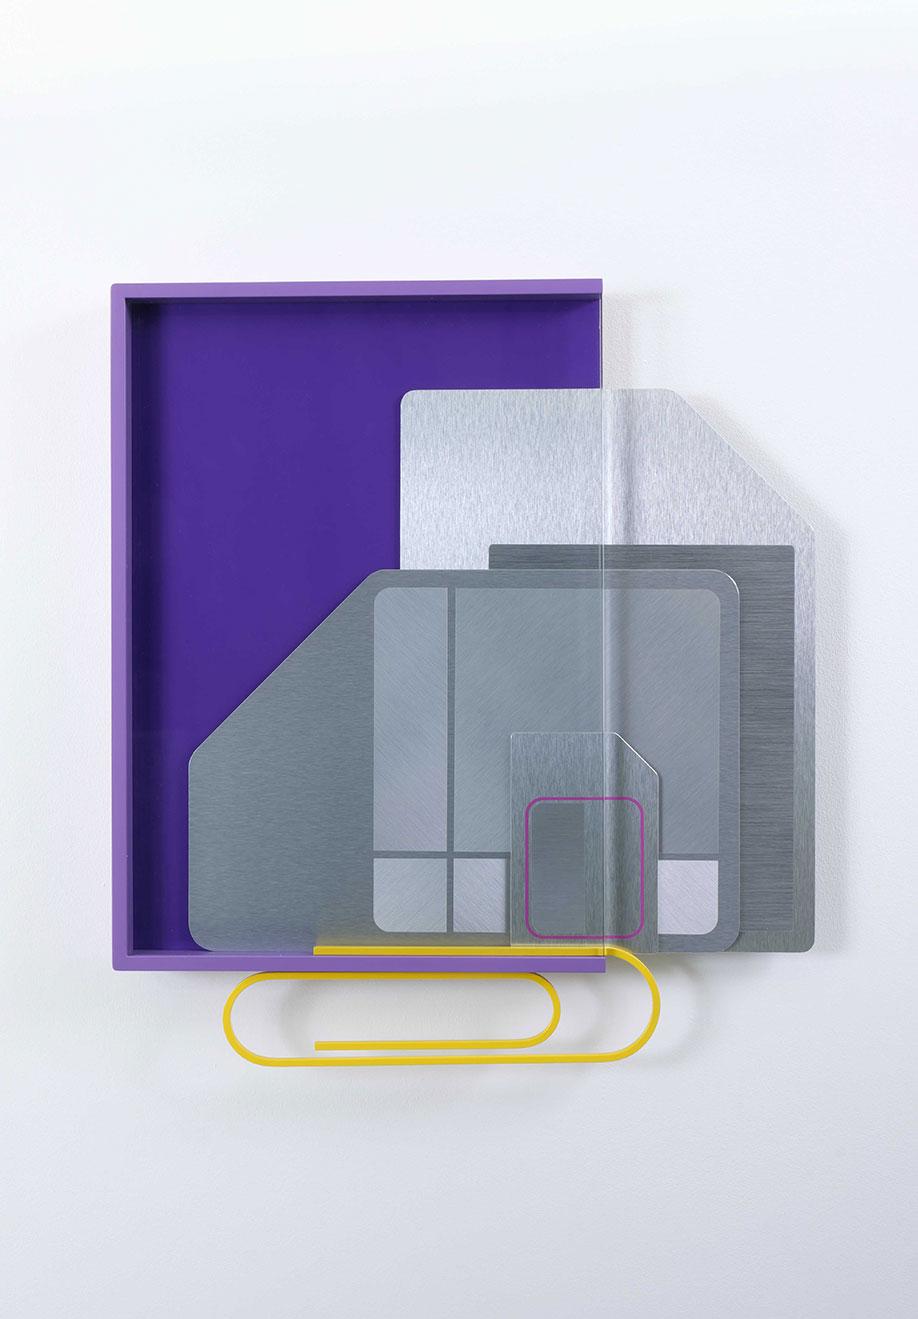 <b>Title:</b>Memories<br /><b>Year:</b>2017<br /><b>Medium:</b>2017 Powder coated aluminium, glass, vinyl, Dibond, bamboo <br /><b>Size:</b>68 cm x 61cm x 6 cm